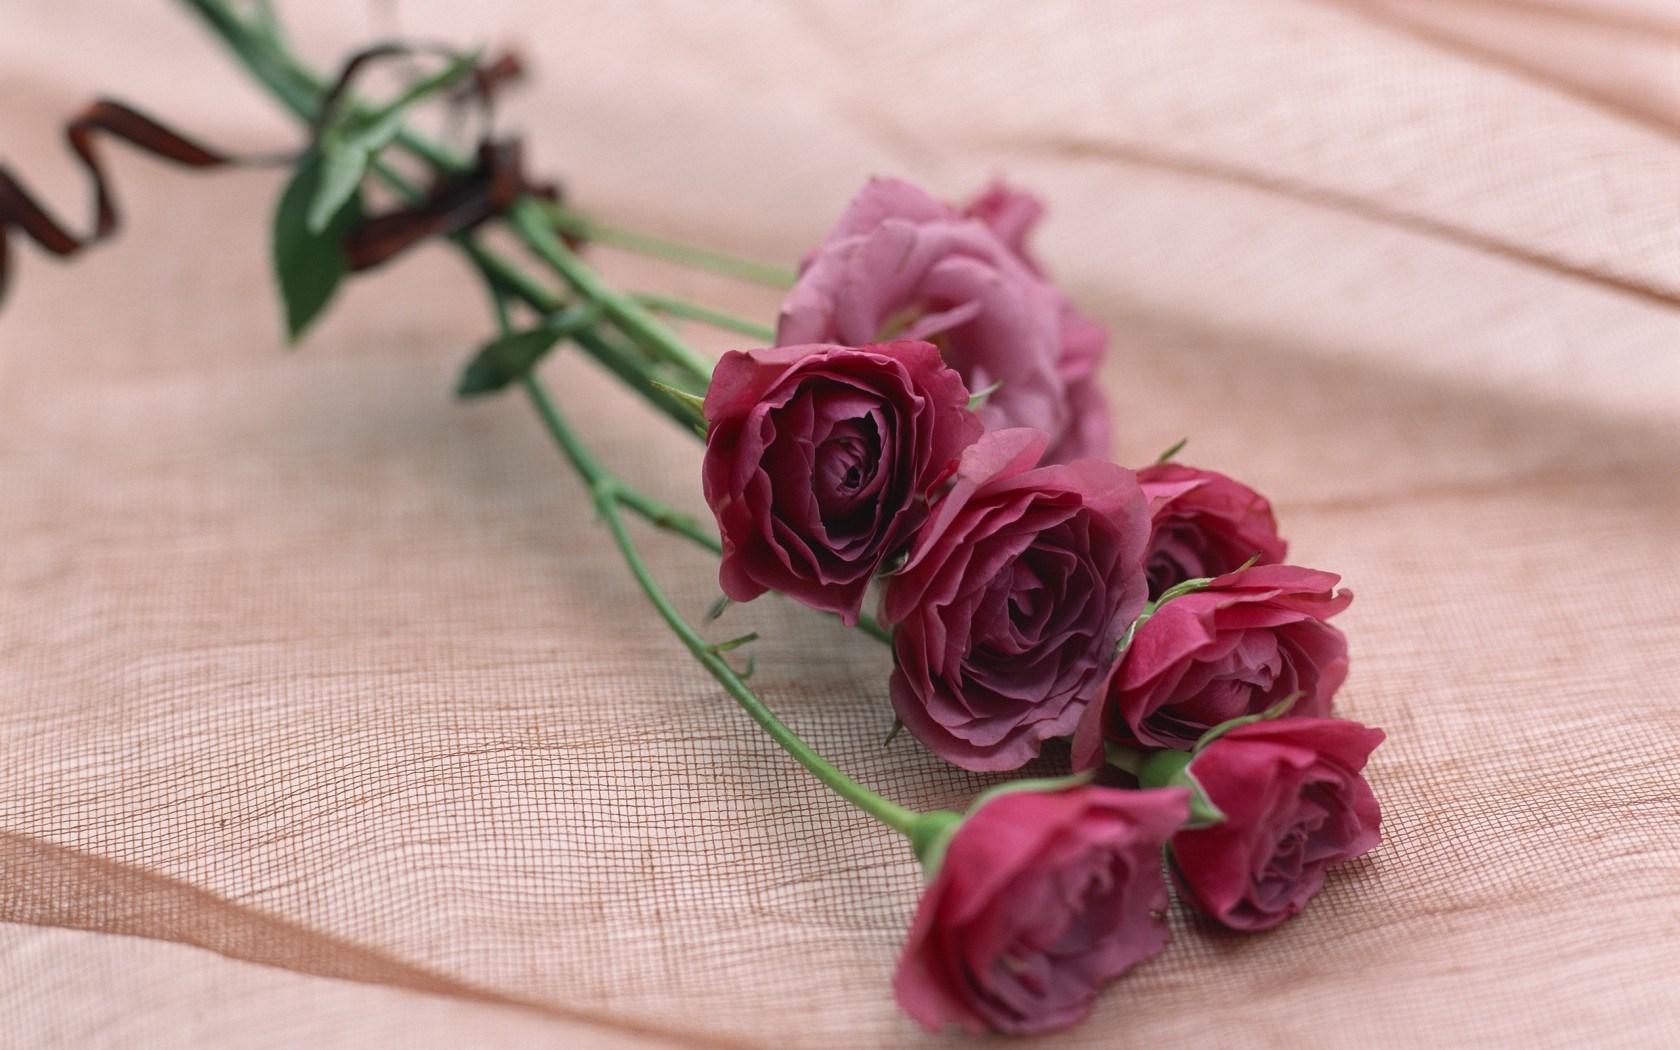 rose photos wallpaper